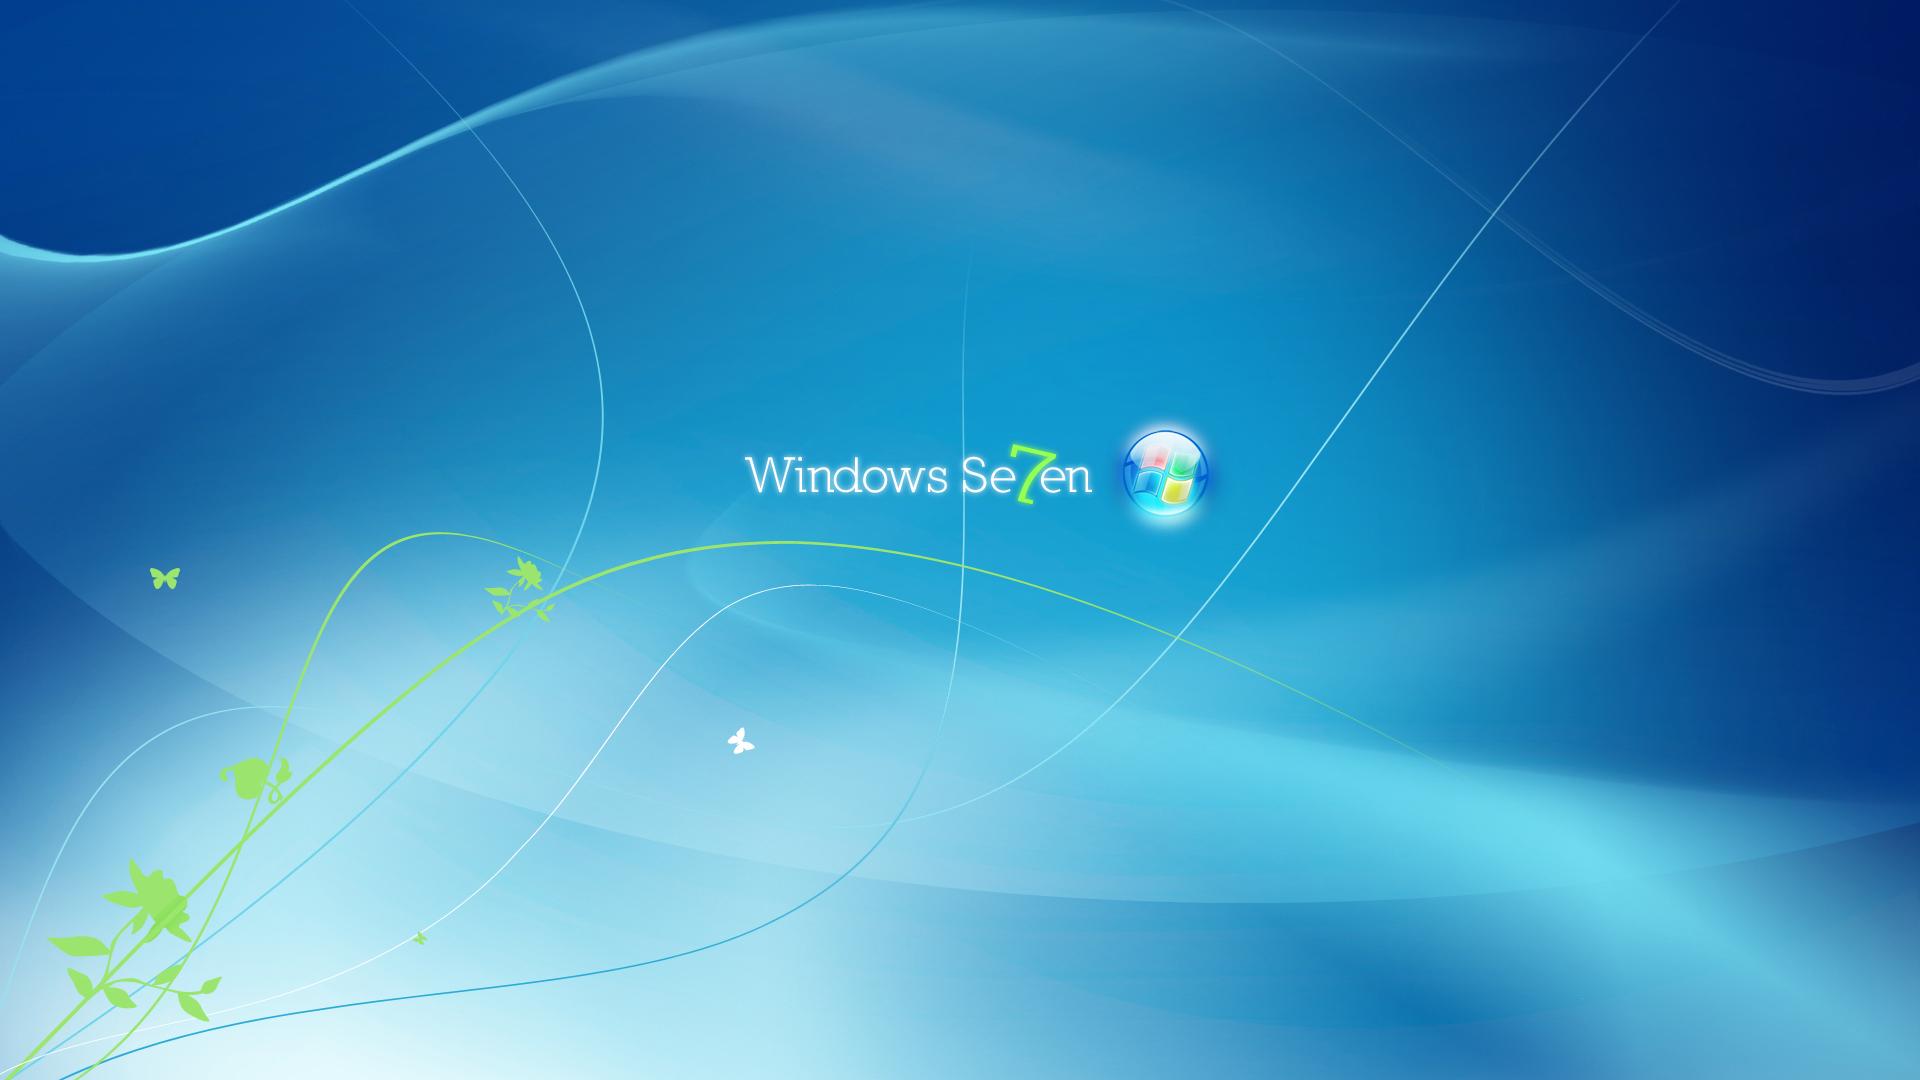 Windows 10 wallpapers hd 3d wallpapersafari - Hd wallpapers for pc windows ...